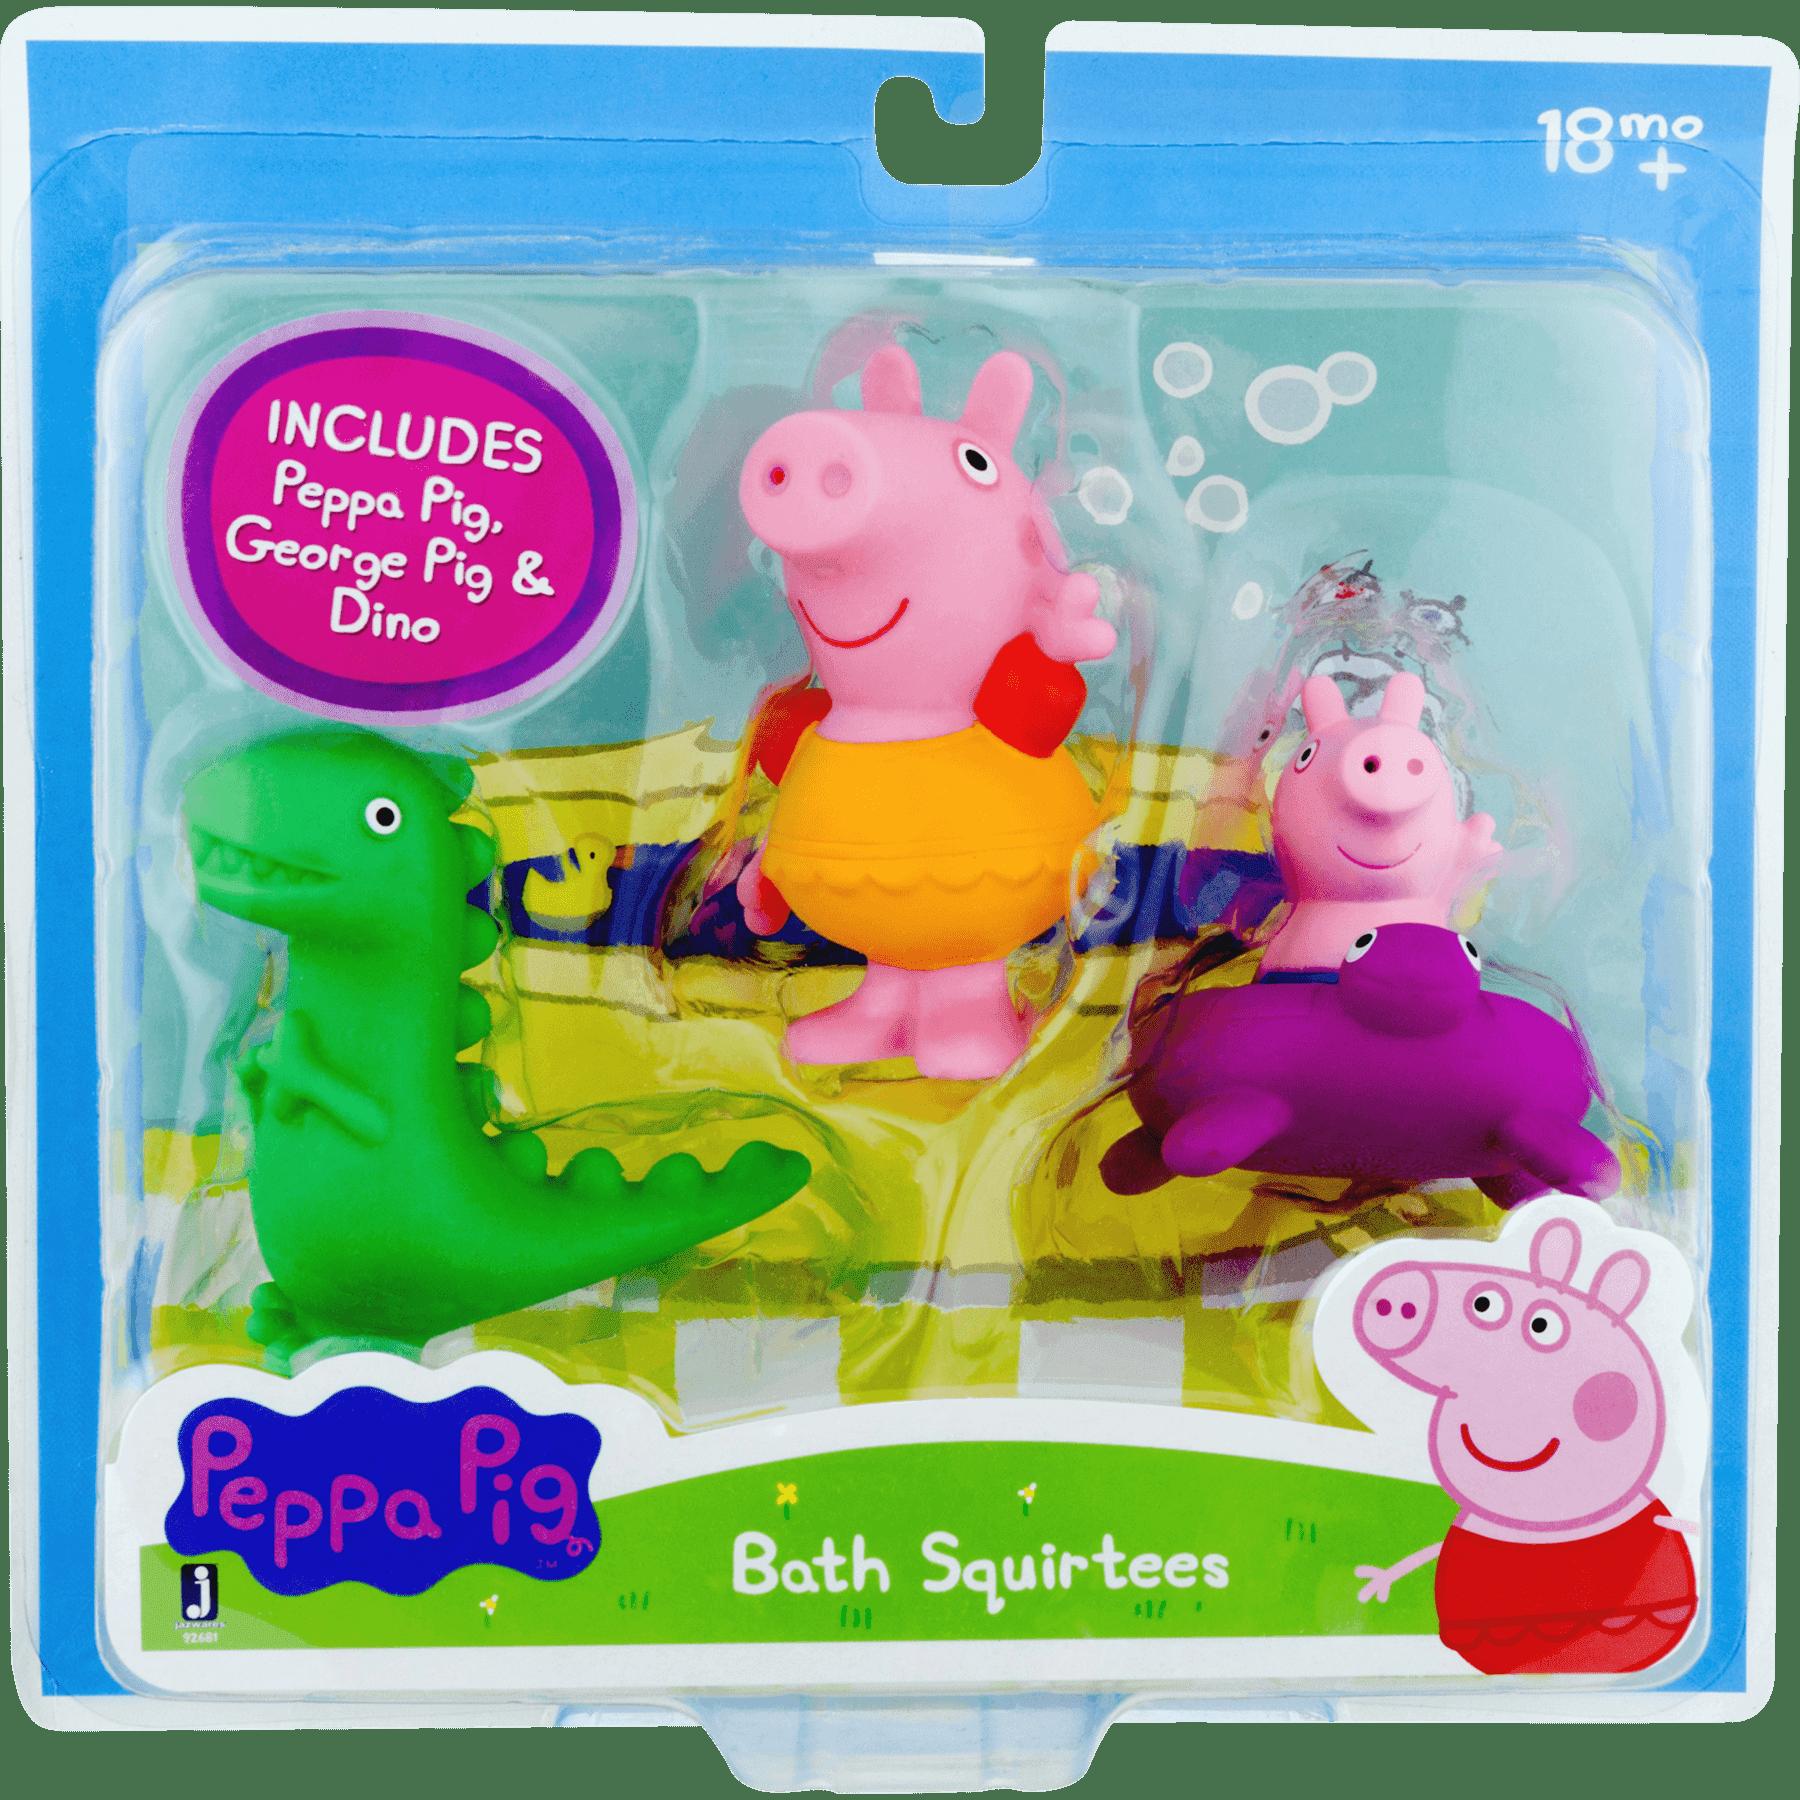 Peppa Pig Bath Squirtees by Peppa Pig